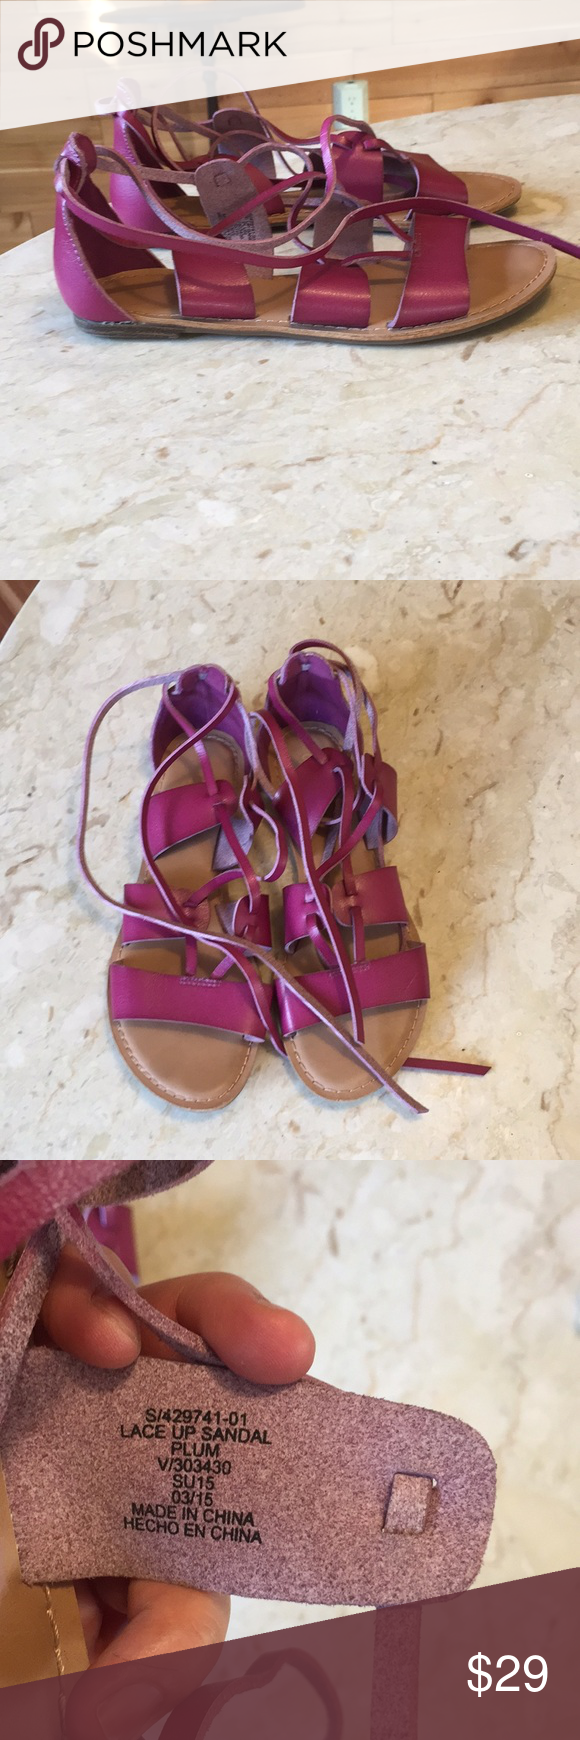 c63f50e9ebc3 Old Navy Plum Purple Lace Up Gladiator Sandals sz8 Old Navy Plum Purple  Lace Up Gladiator Sandals sz8. Excellent used condition